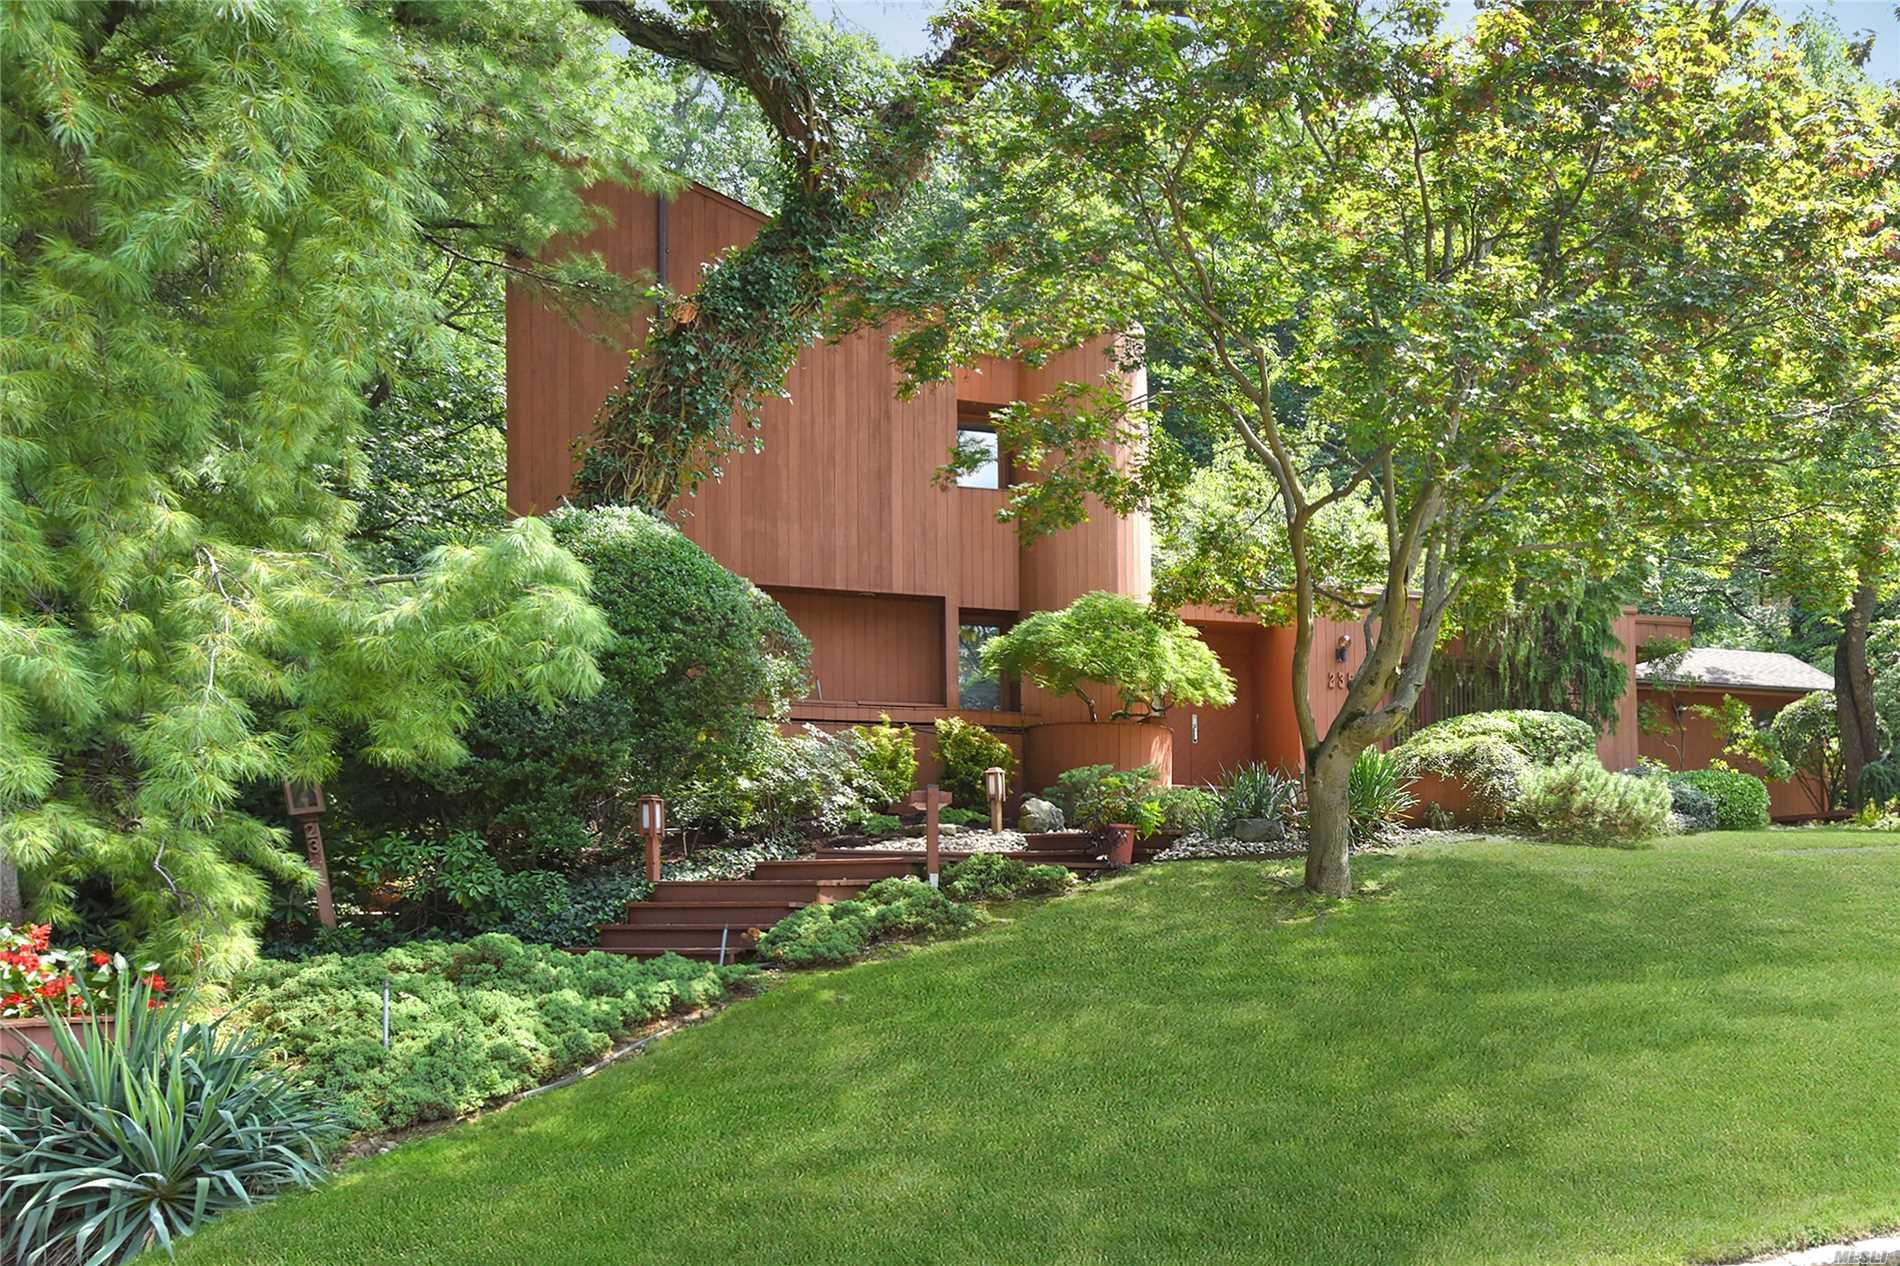 235 Chestnut Dr East Hills, NY 11576